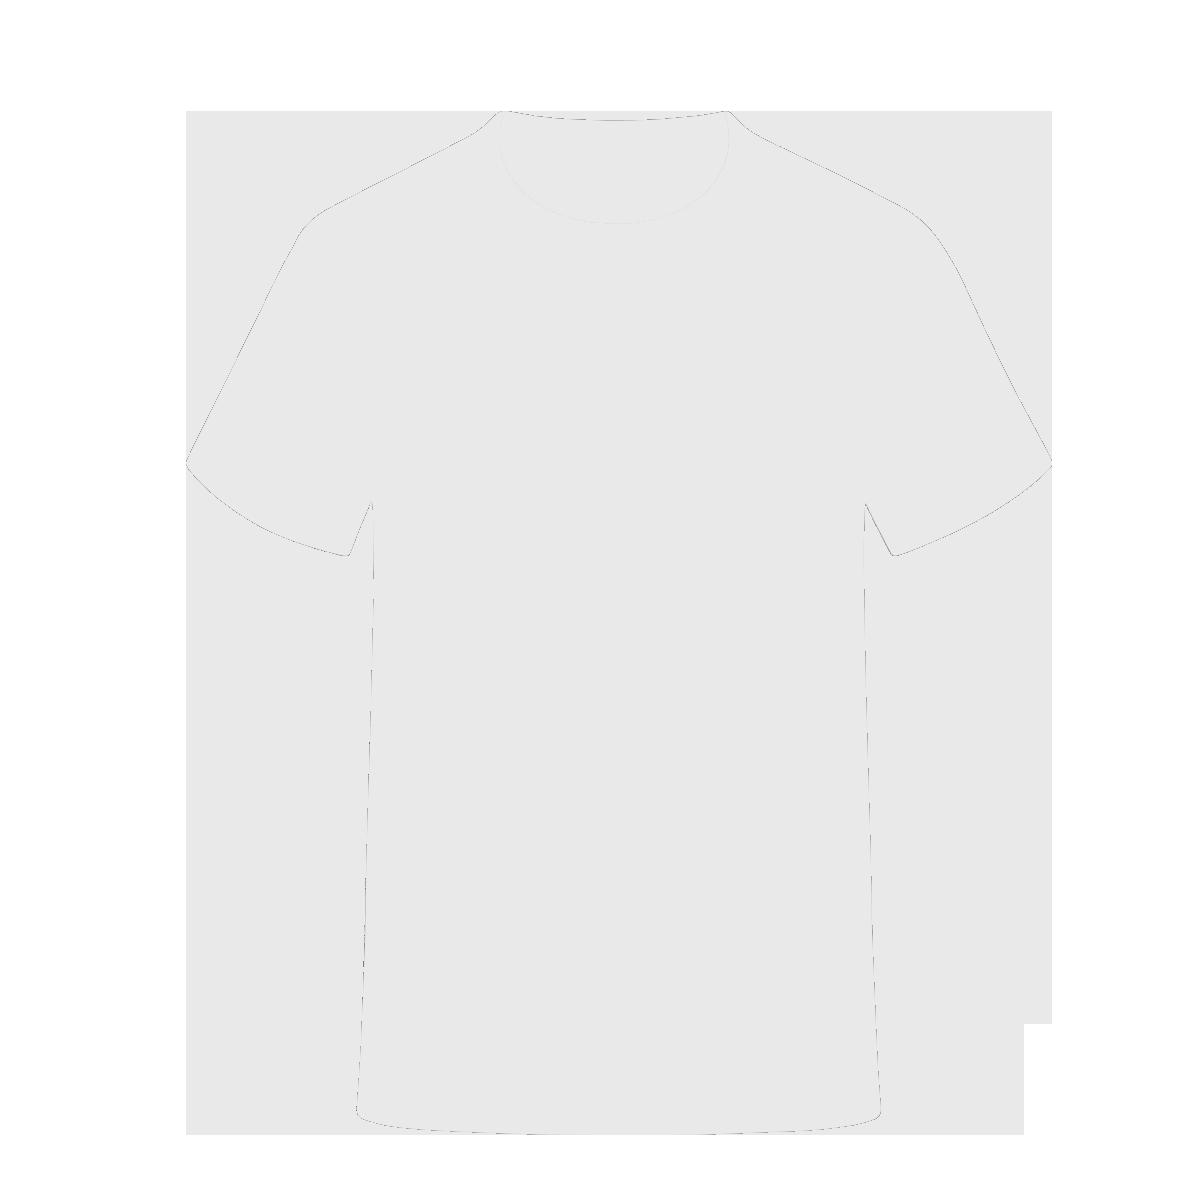 Basis 3